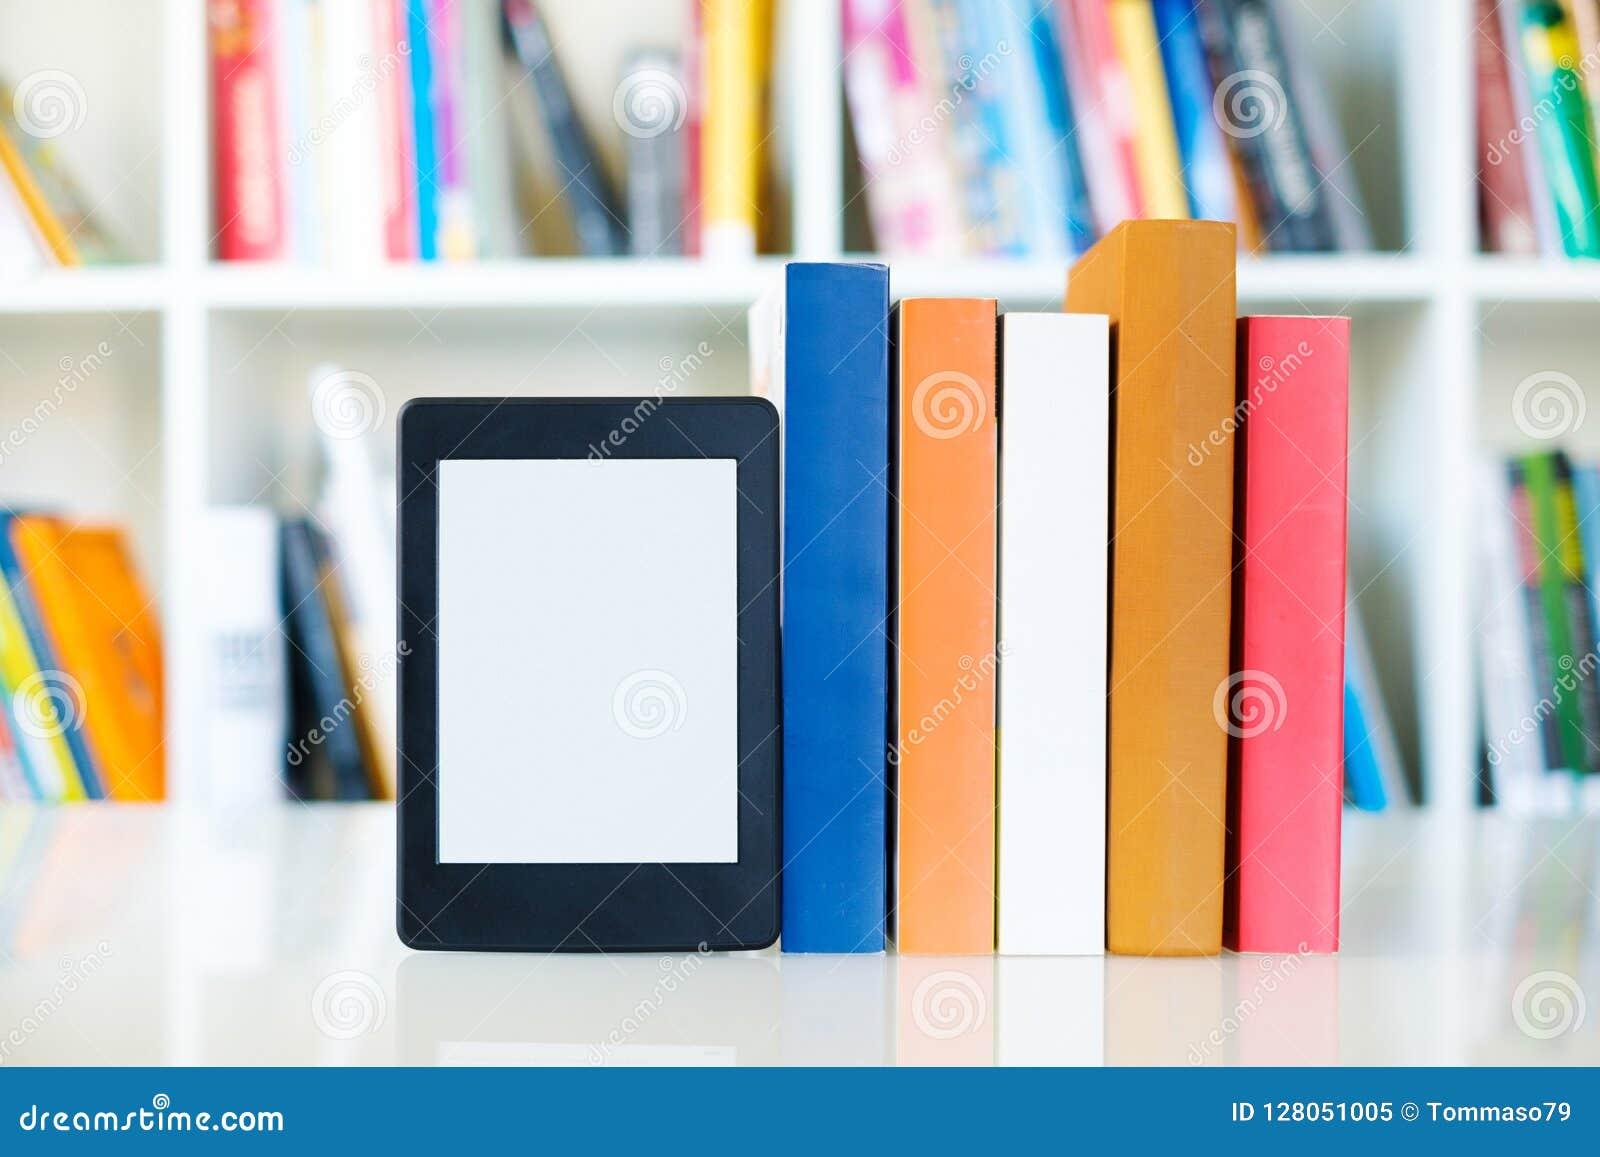 Electronics Books Ebook